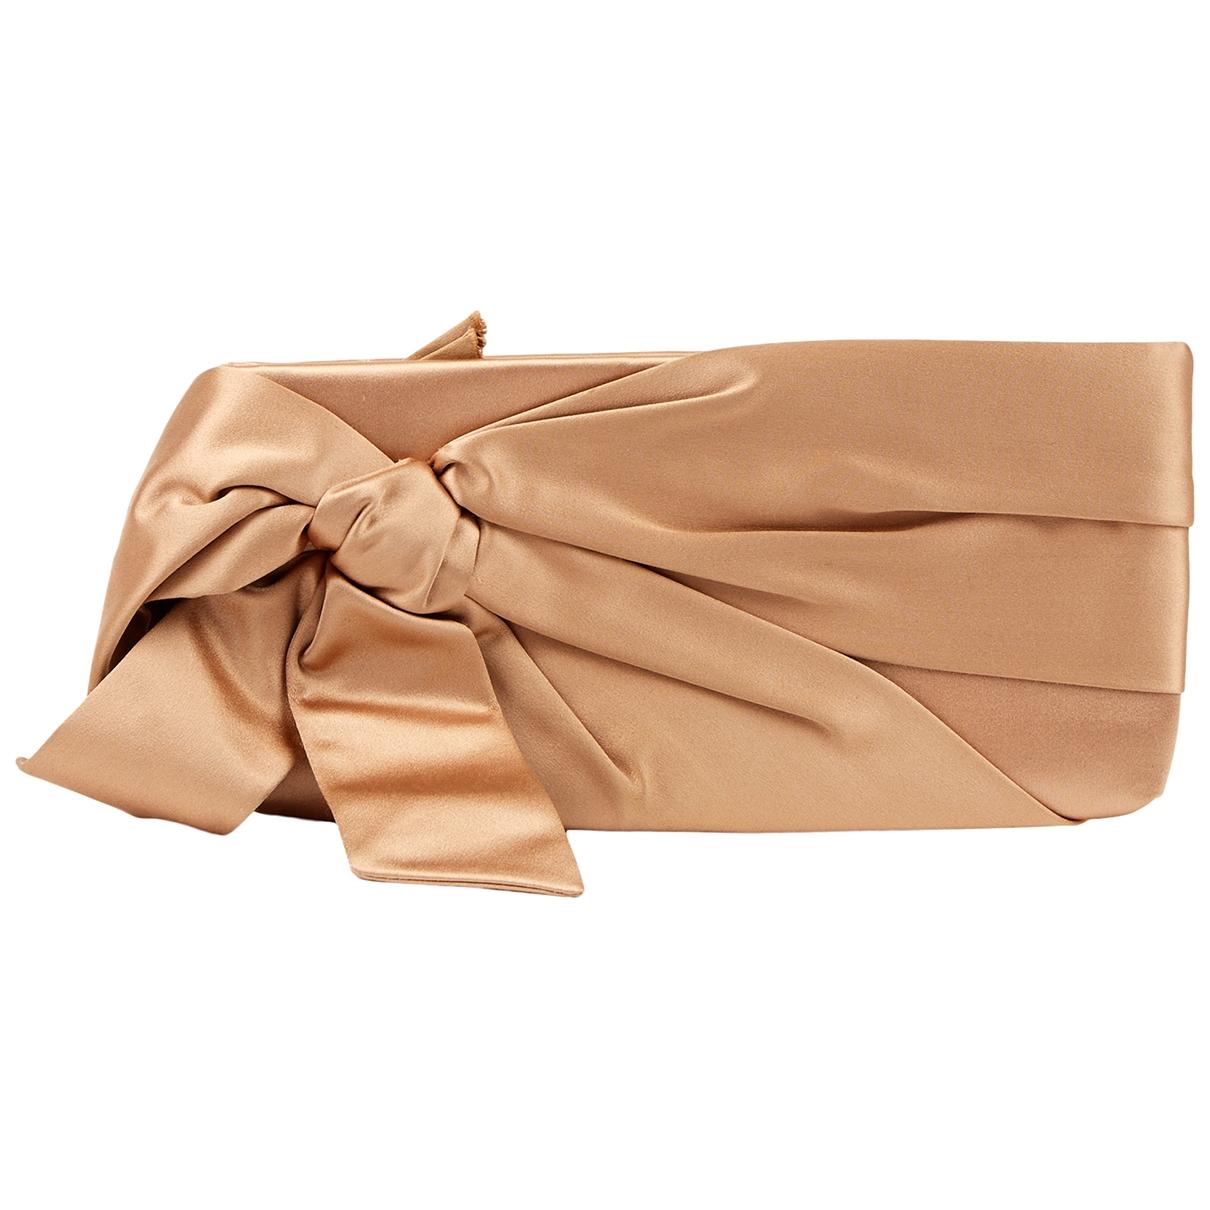 Valentino Garavani - Petite maroquinerie   pour femme en soie - beige